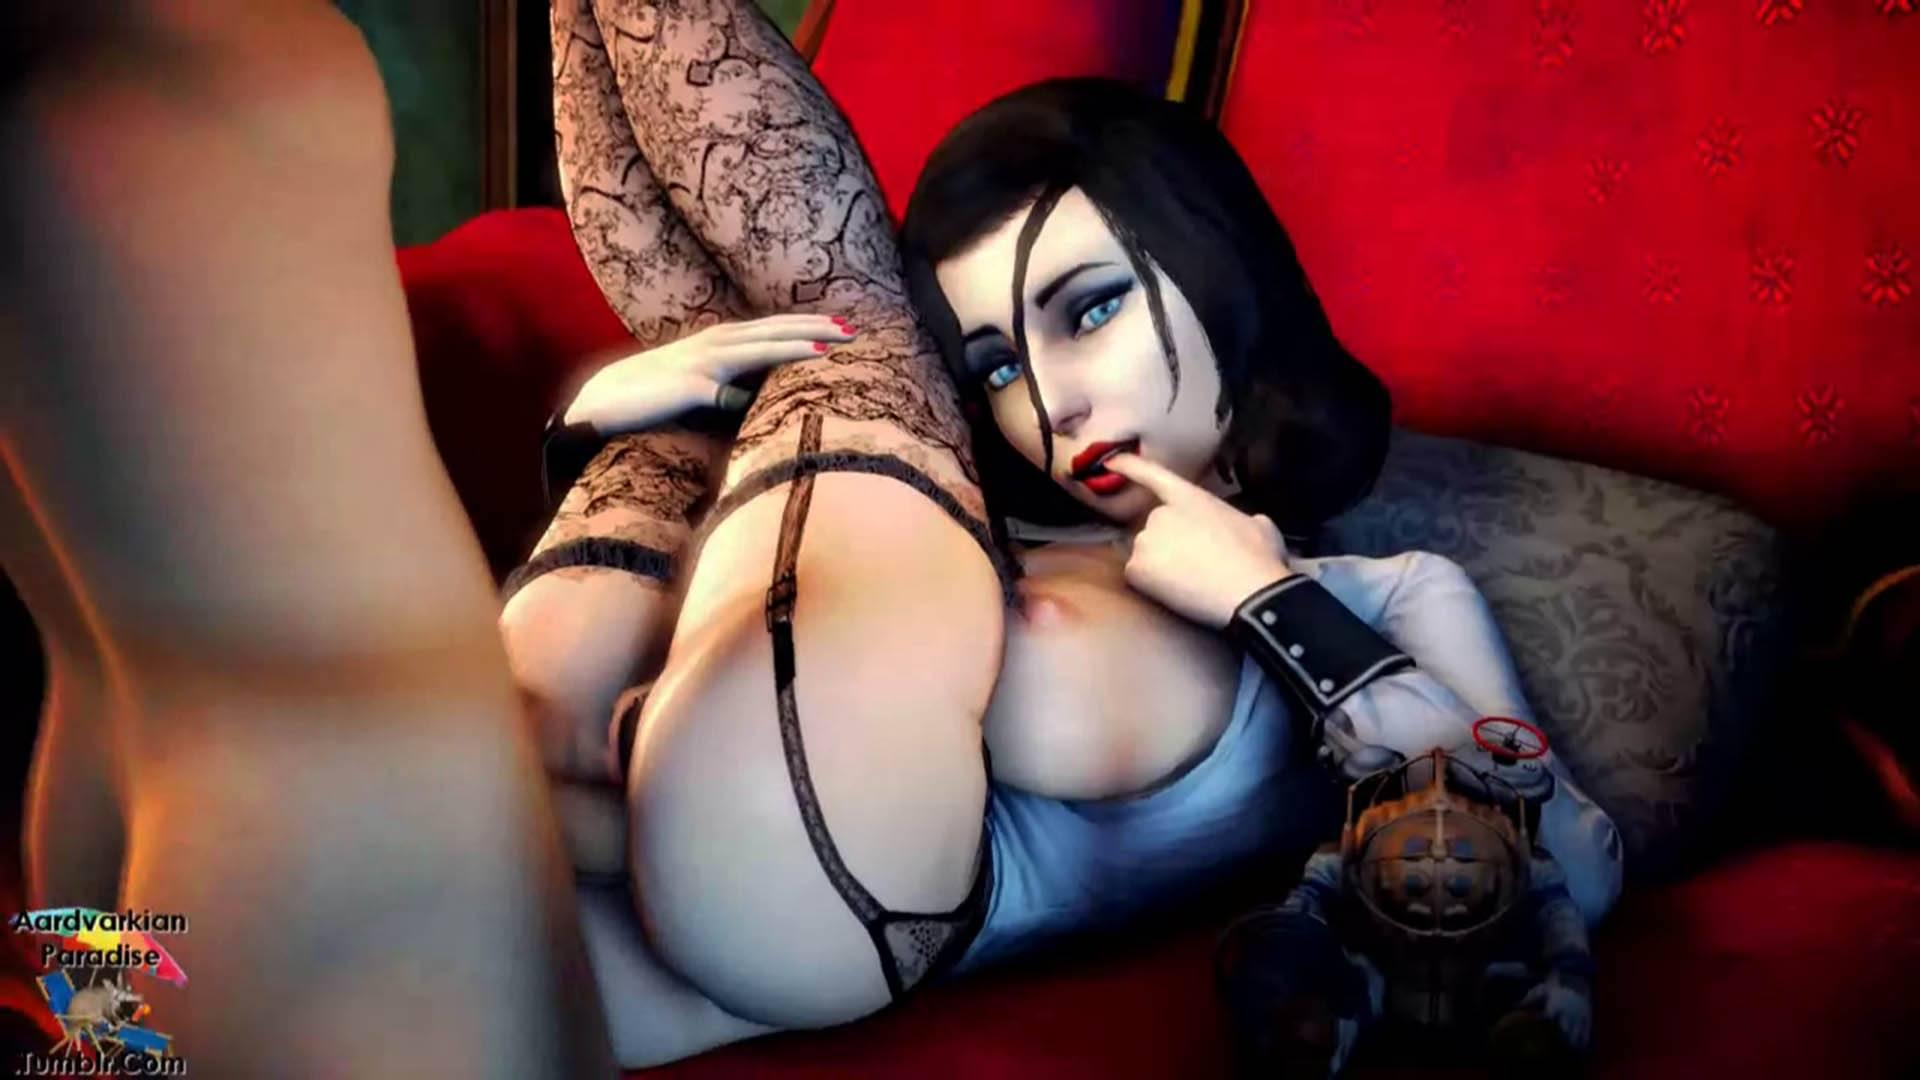 Elizabeth rose порно анал онлайн